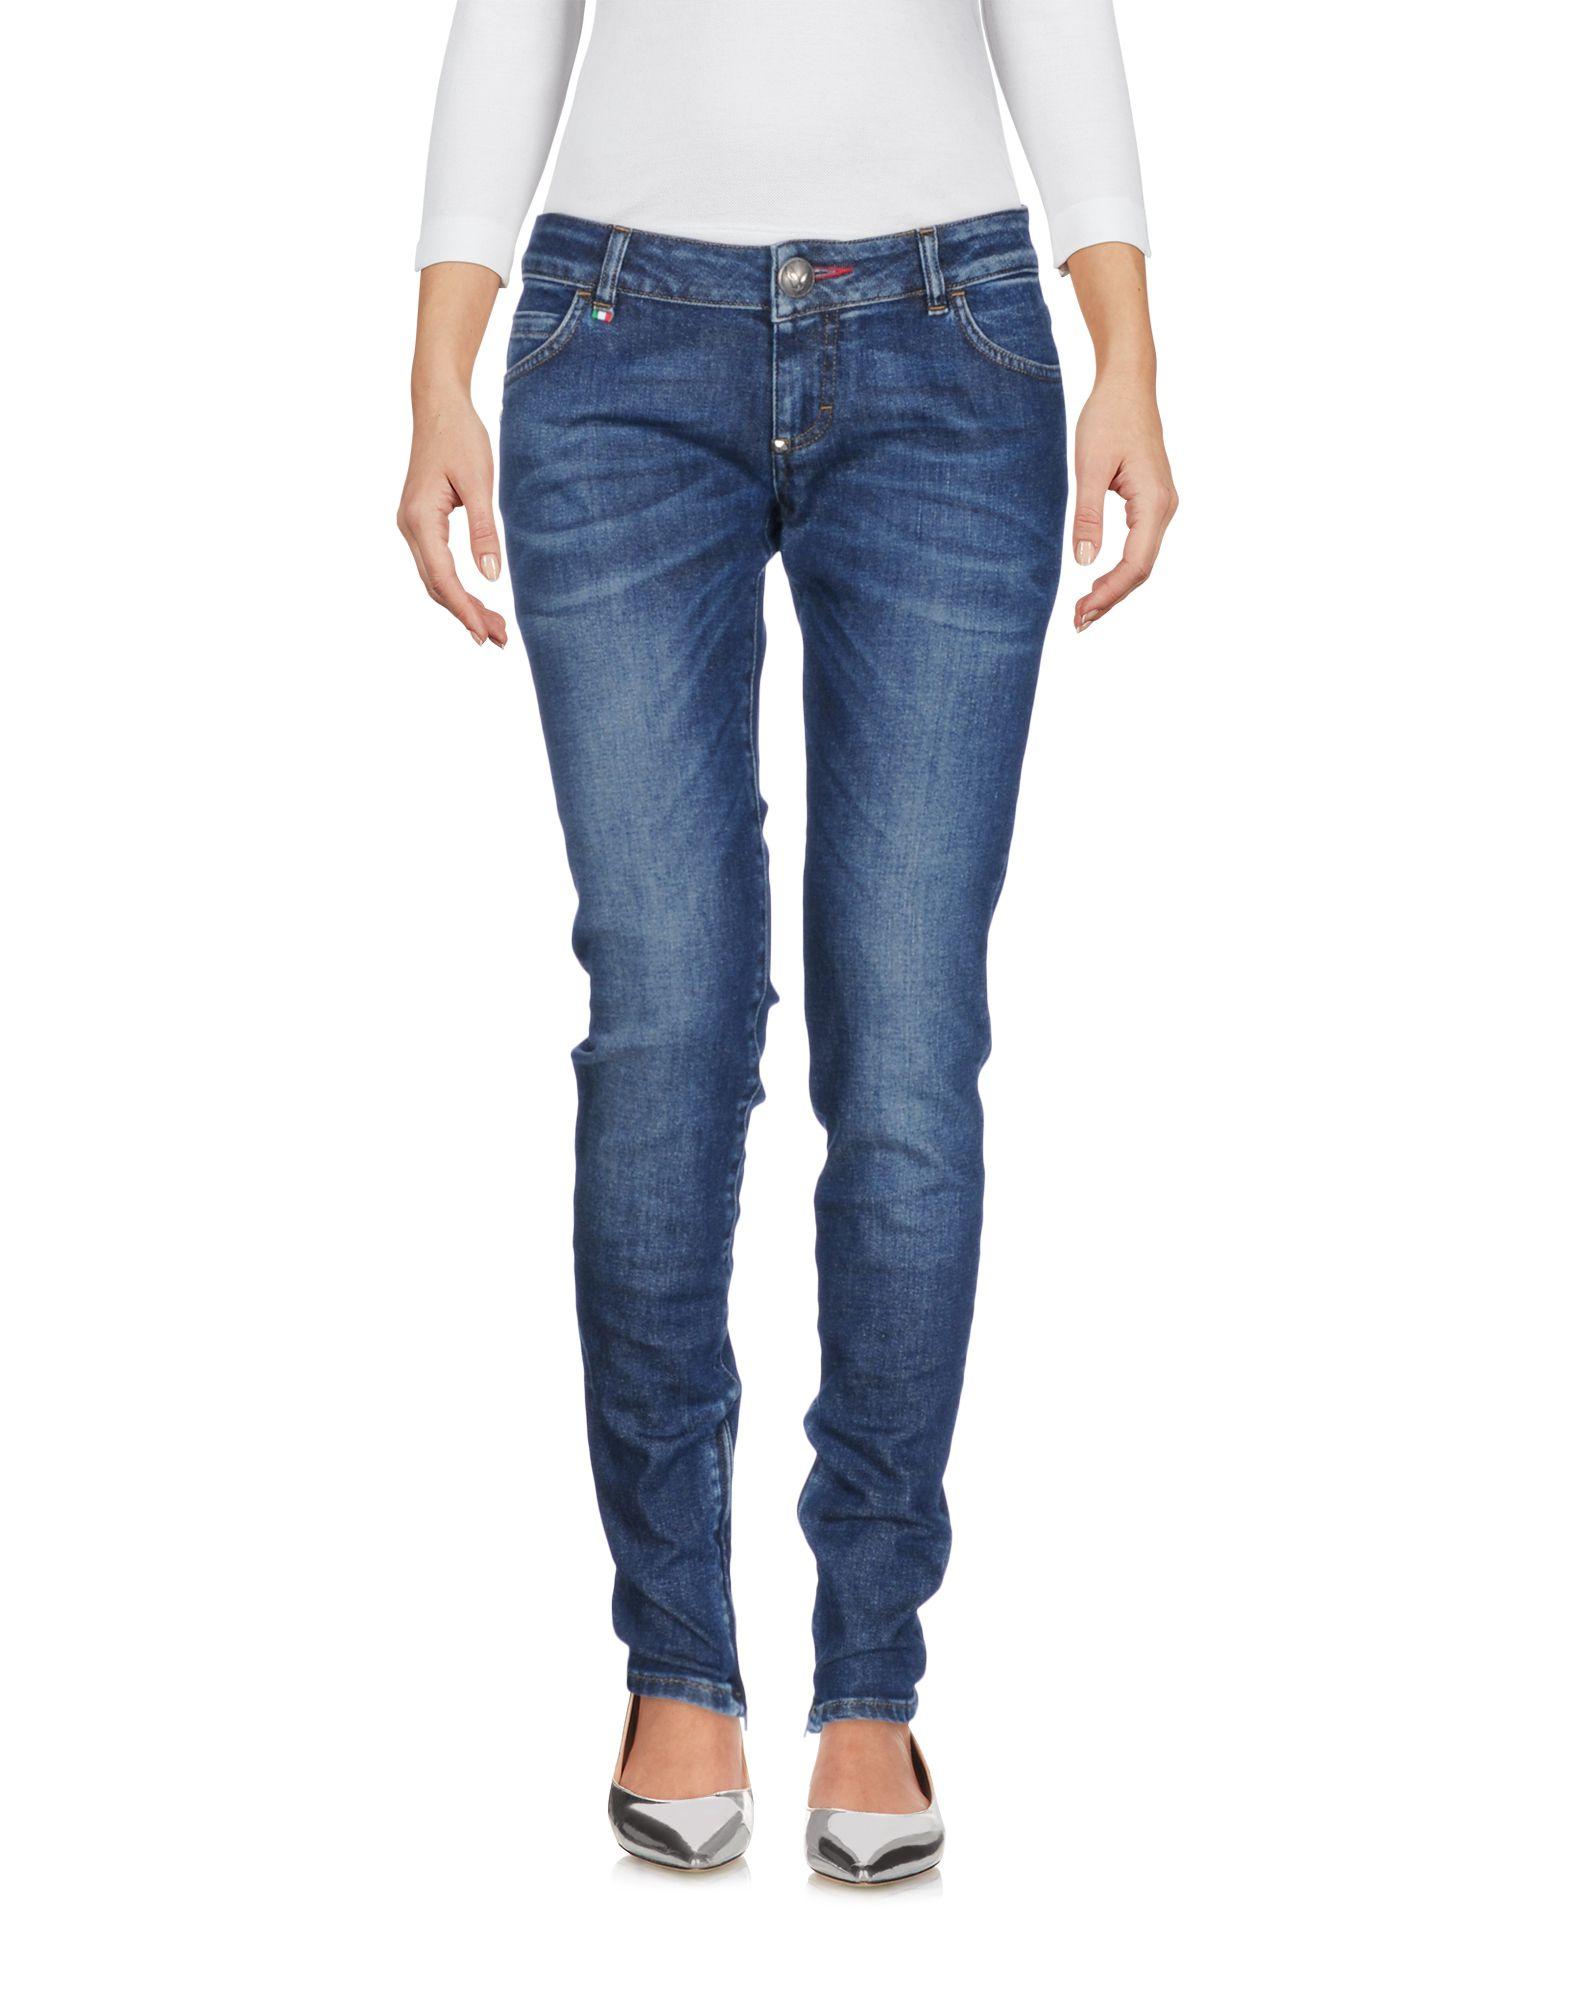 Pantaloni Jeans Philipp Plein Donna - Acquista online su BAtncQ